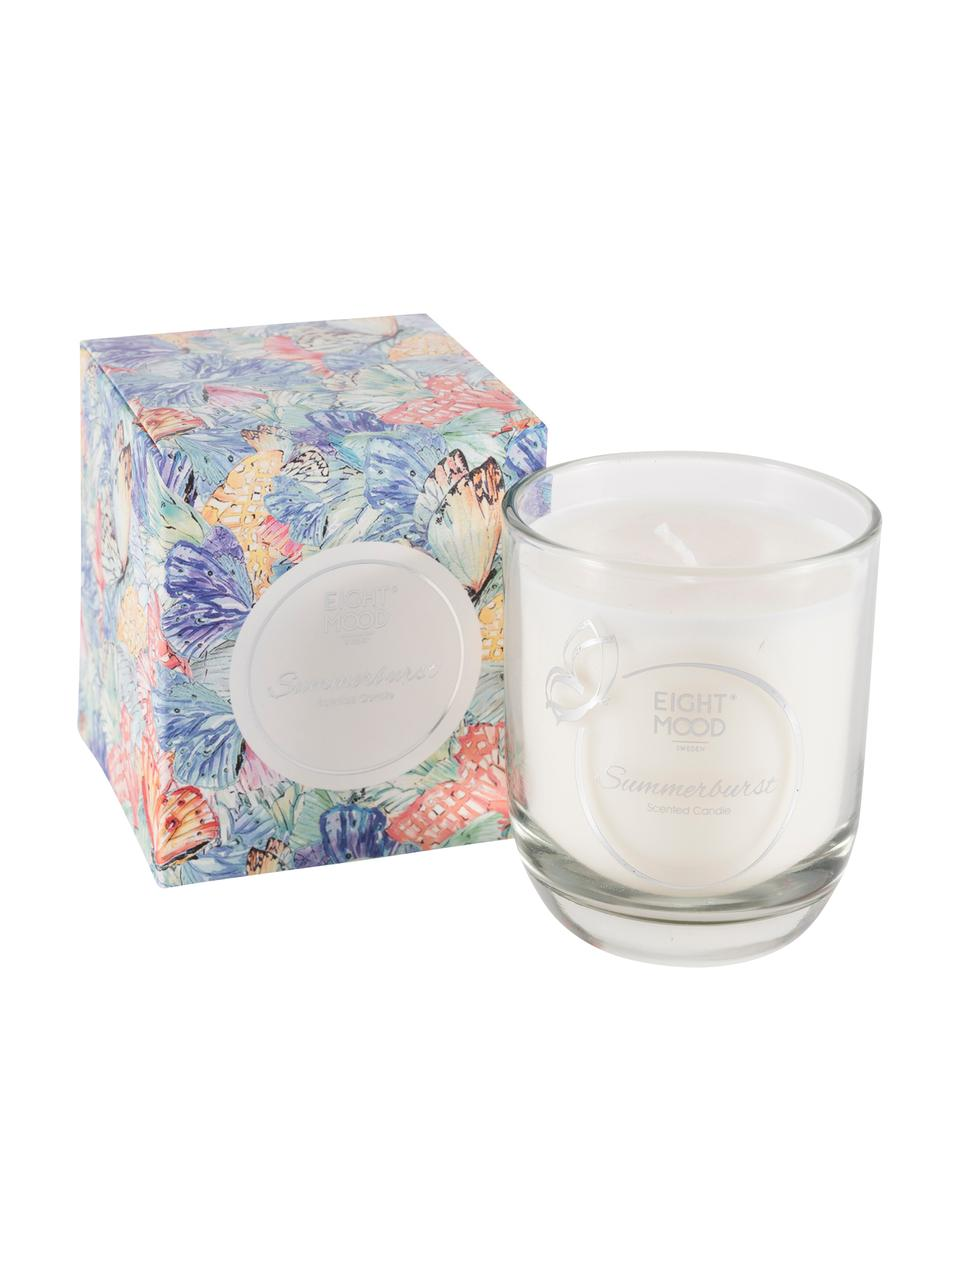 Duftkerze Summerburst (Apfel, Cassis & Orange), Box: Papier, Behälter: Glas, Blau, Mehrfarbig, 8 x 9 cm